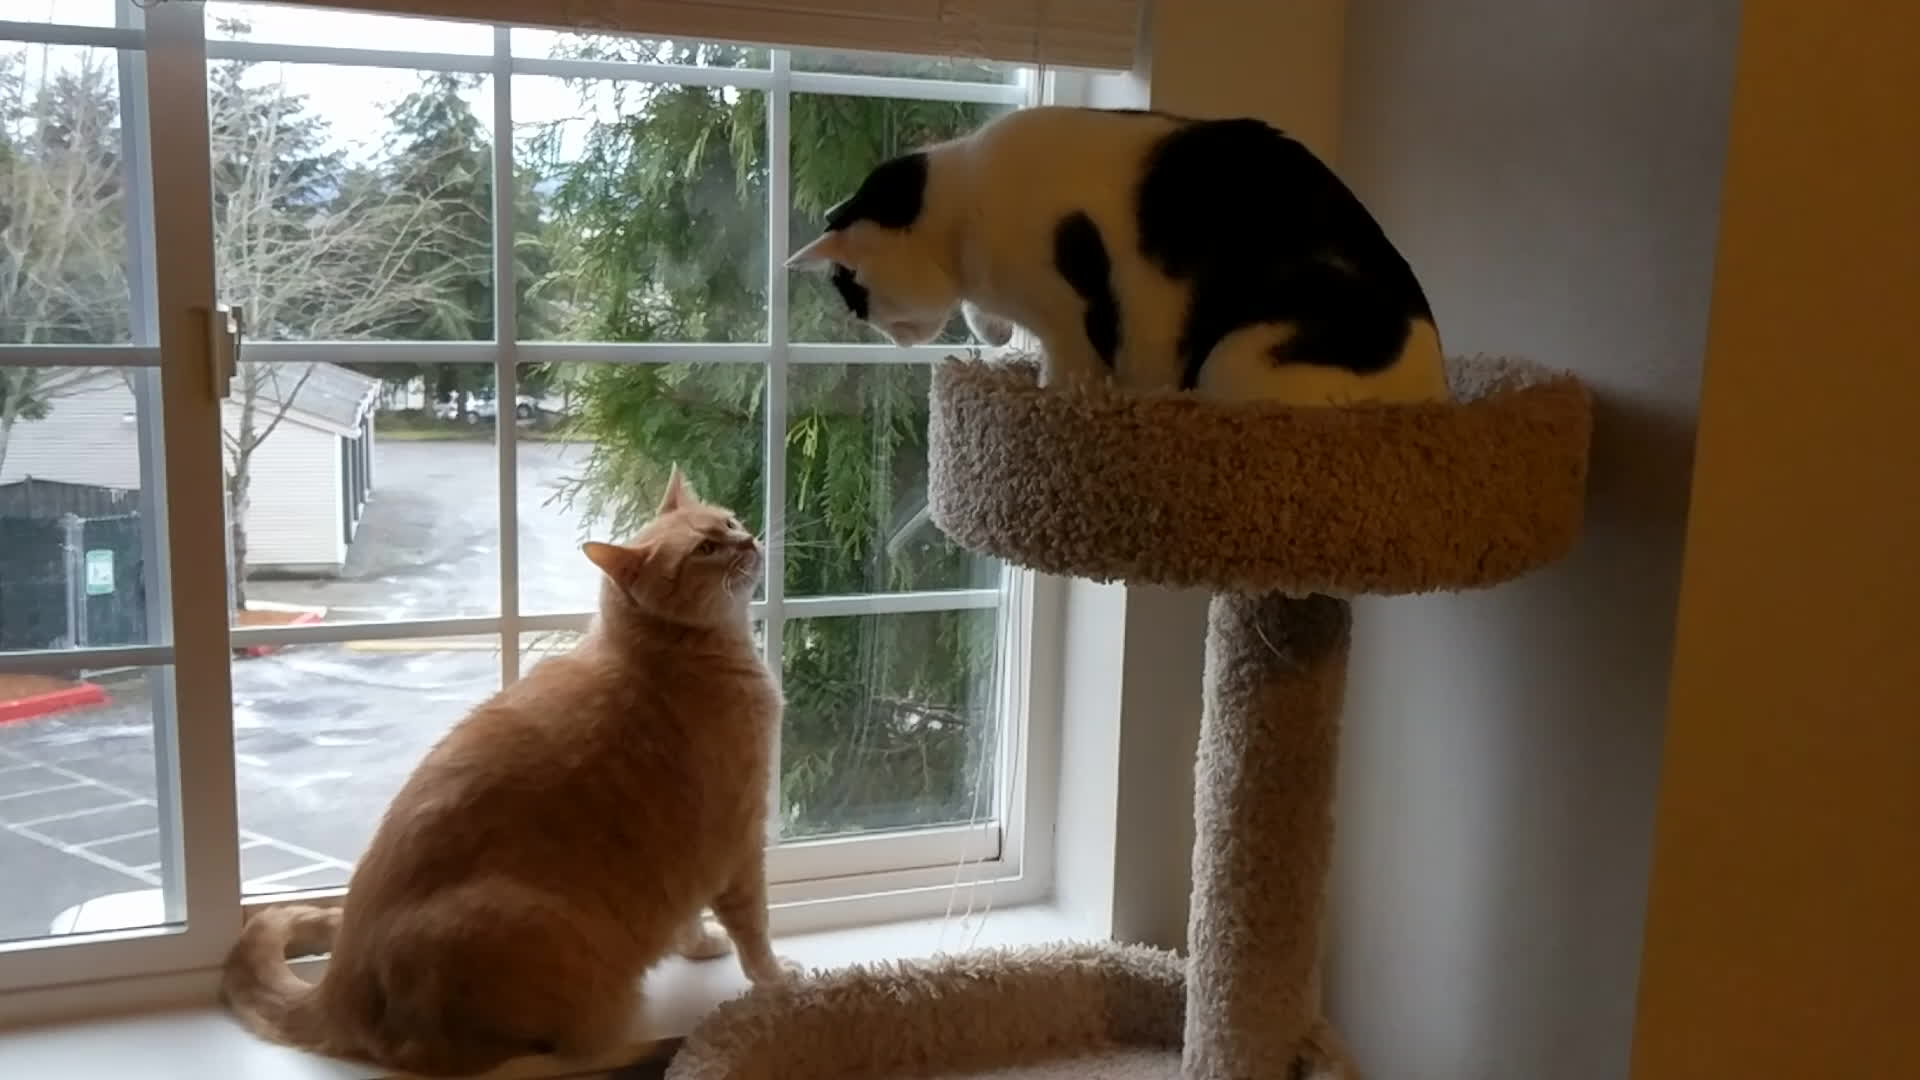 cat taps and slaps, catslaps, kitten,  GIFs